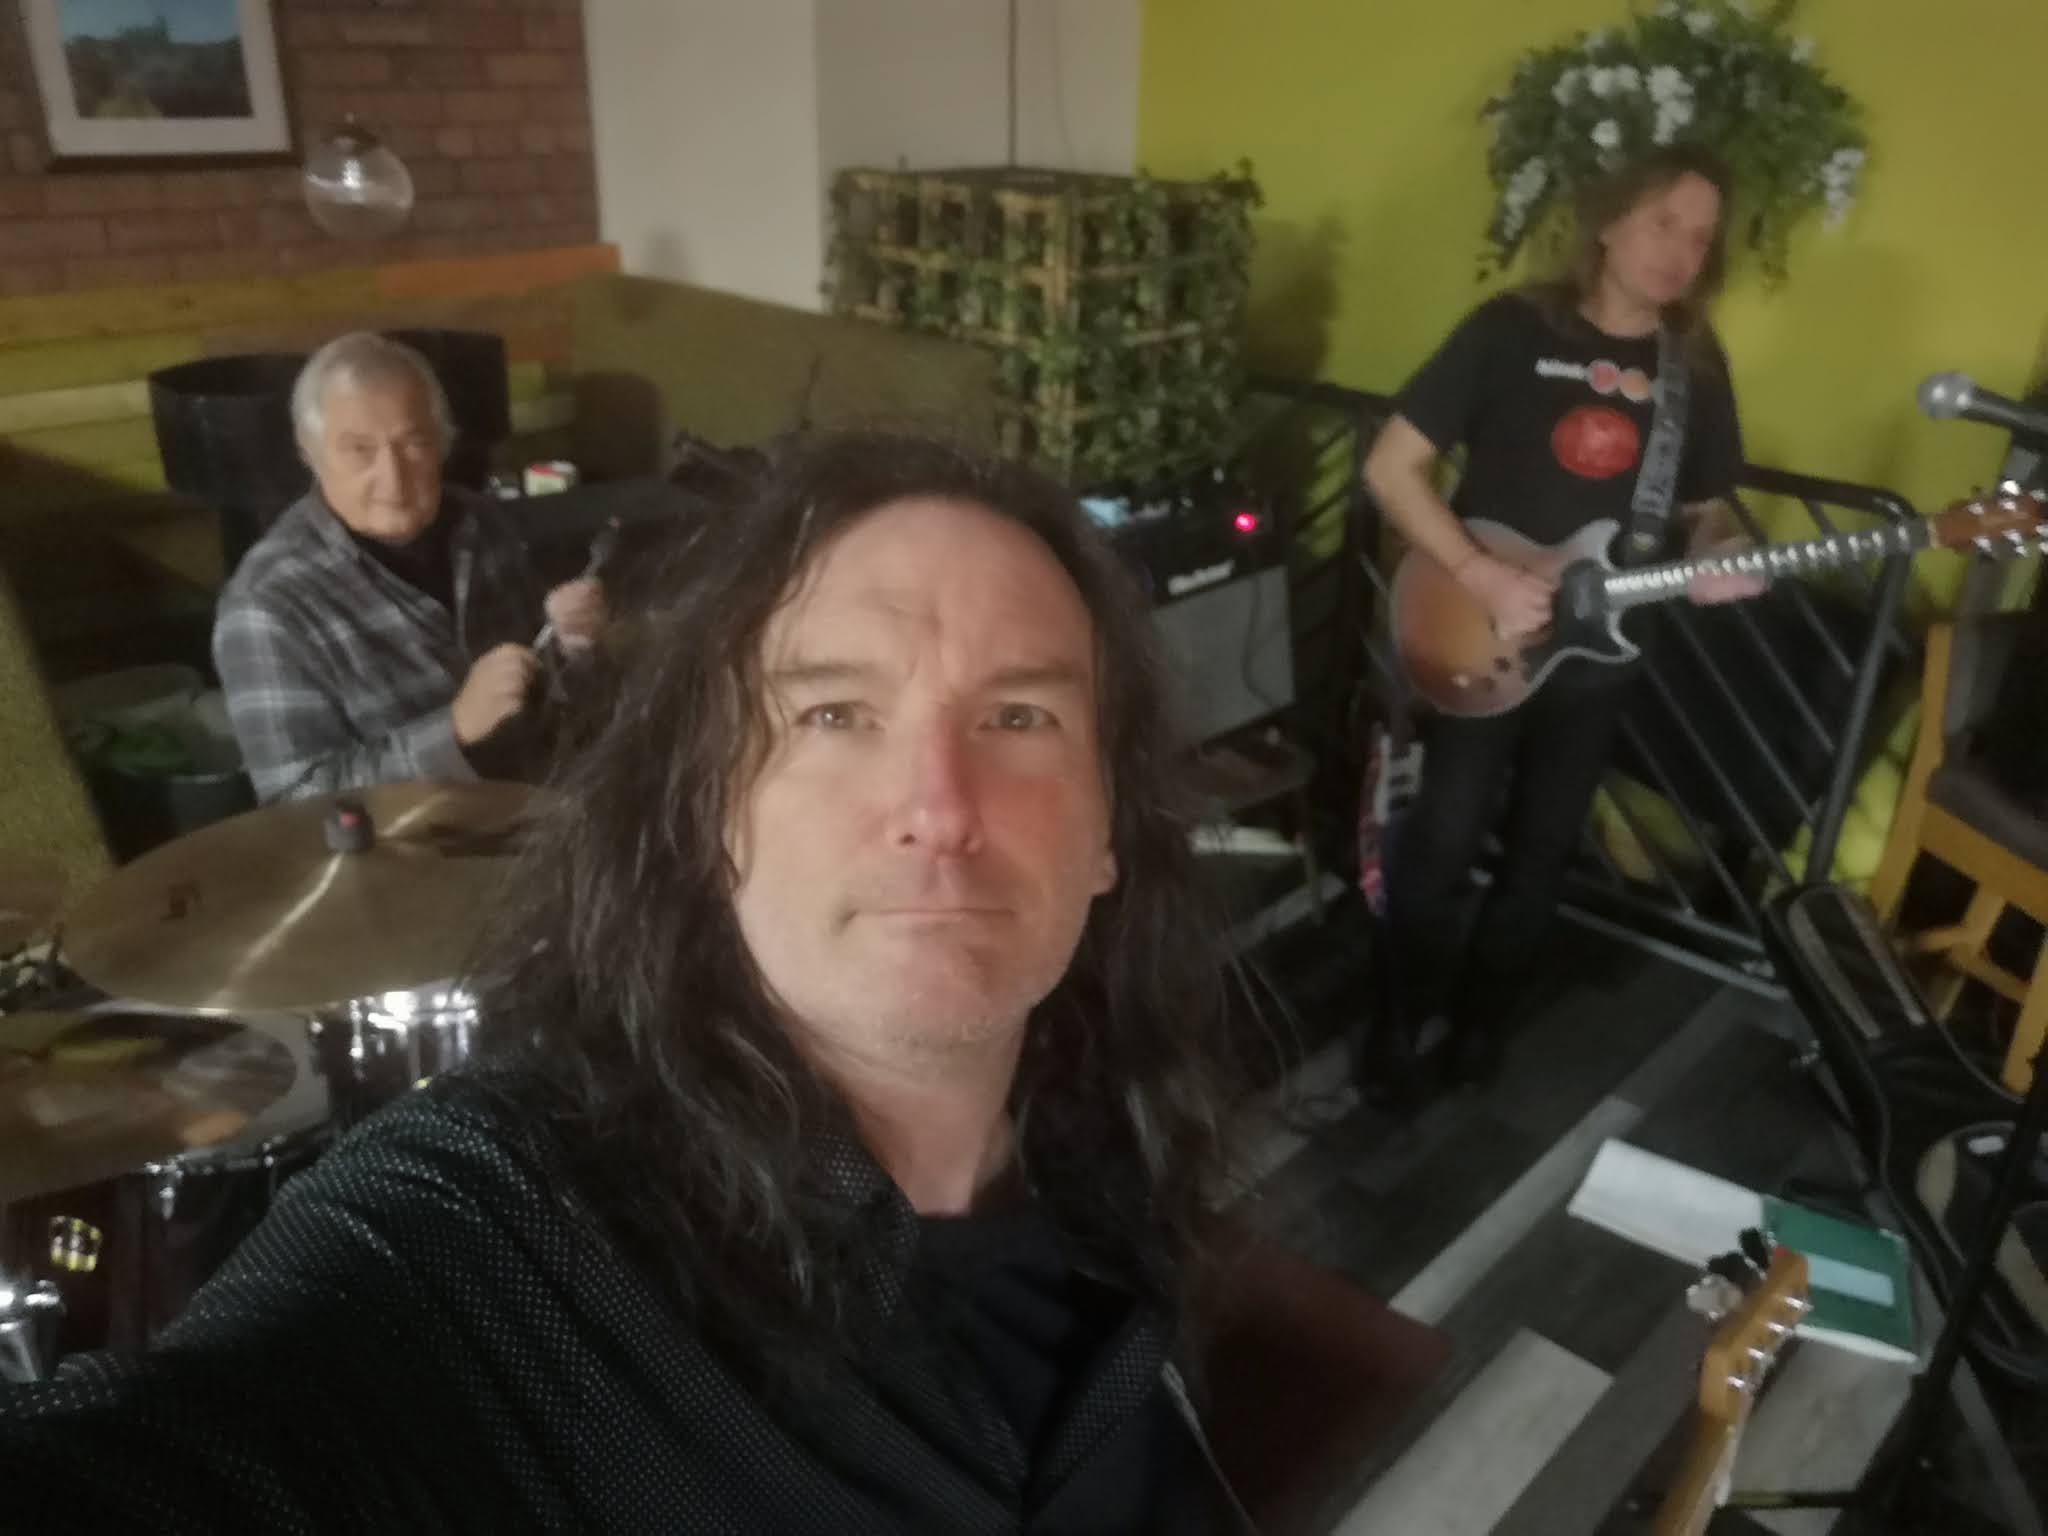 The Three in rehearsal.